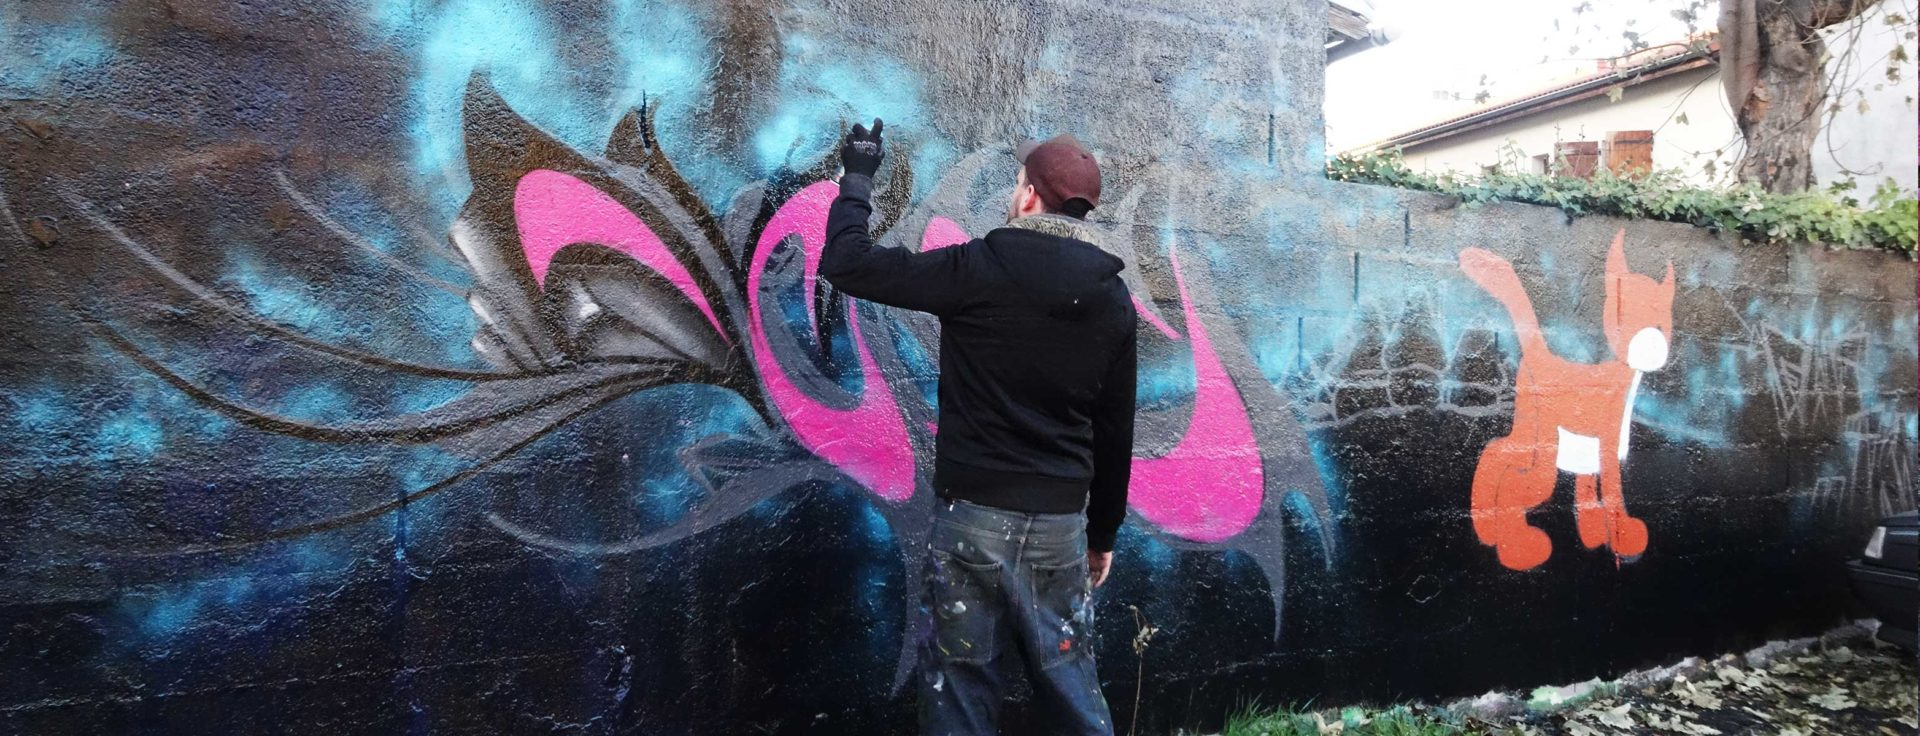 graffiti_Schroumph_deft_2013_6